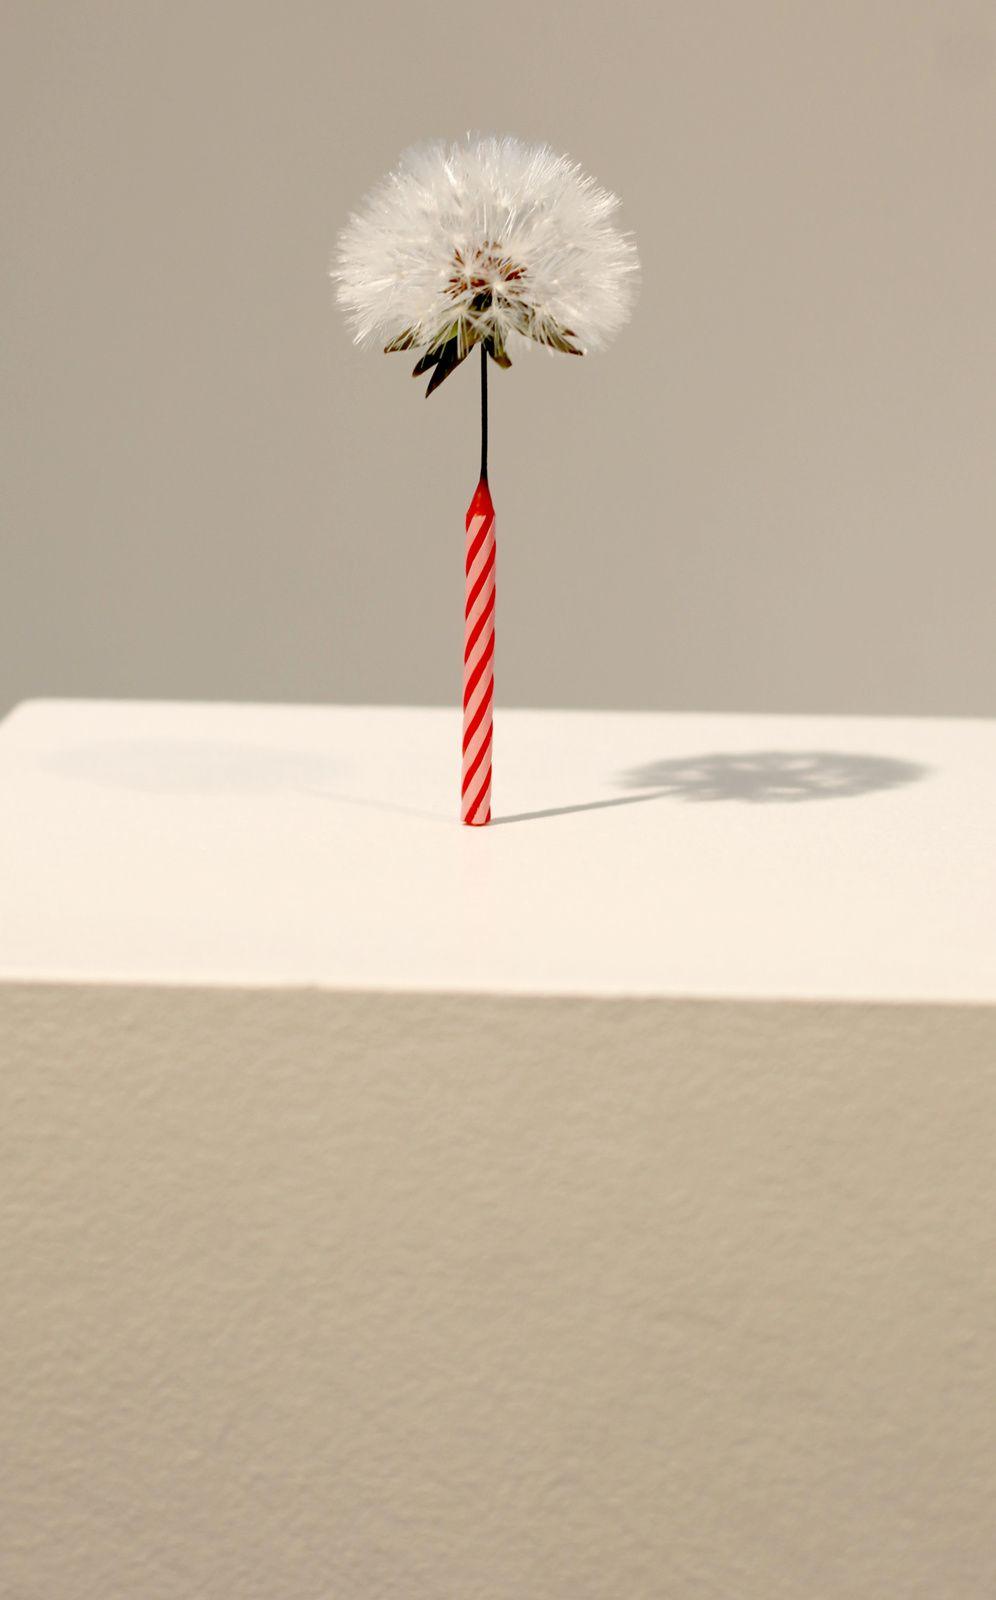 """Birth"", 2017 de MYEONGBEOM KIM - Courtesy Galerie Paris-Beijing © Photo Éric Simon"